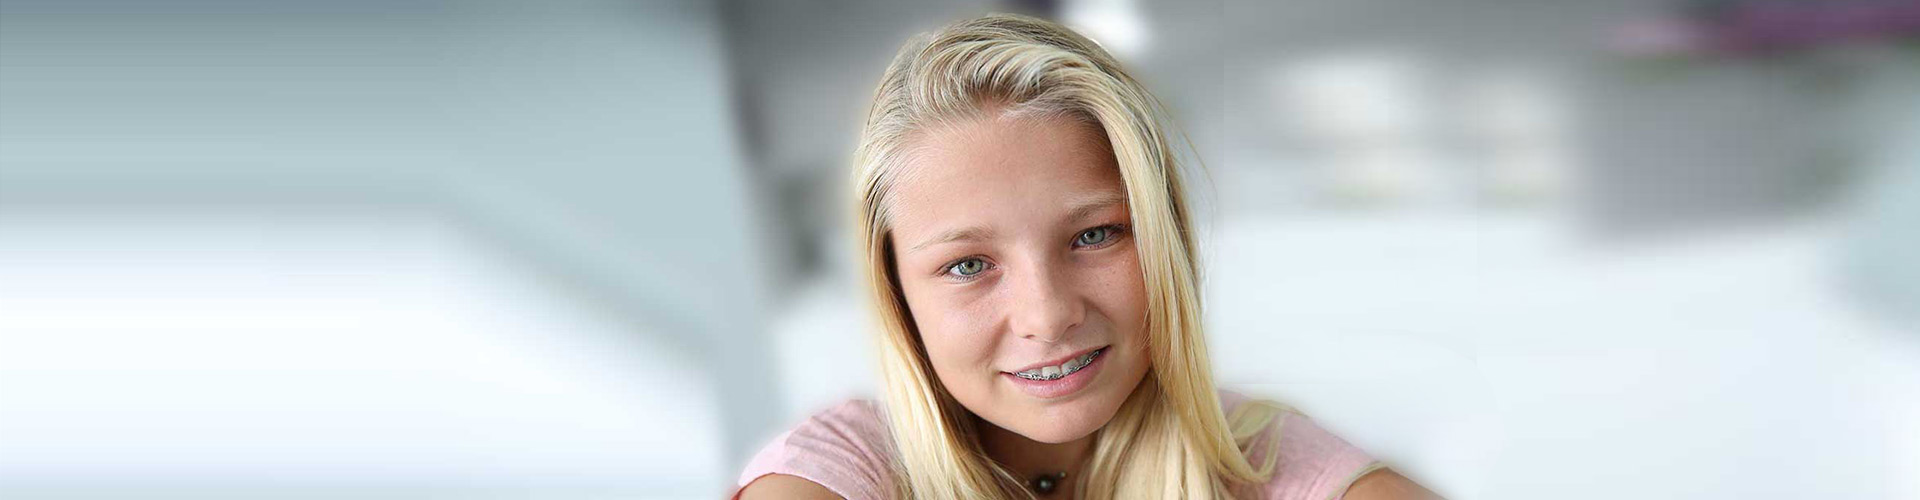 Minor Troubles   Decoteau Orthodontics   Groton MA and Nashua NH